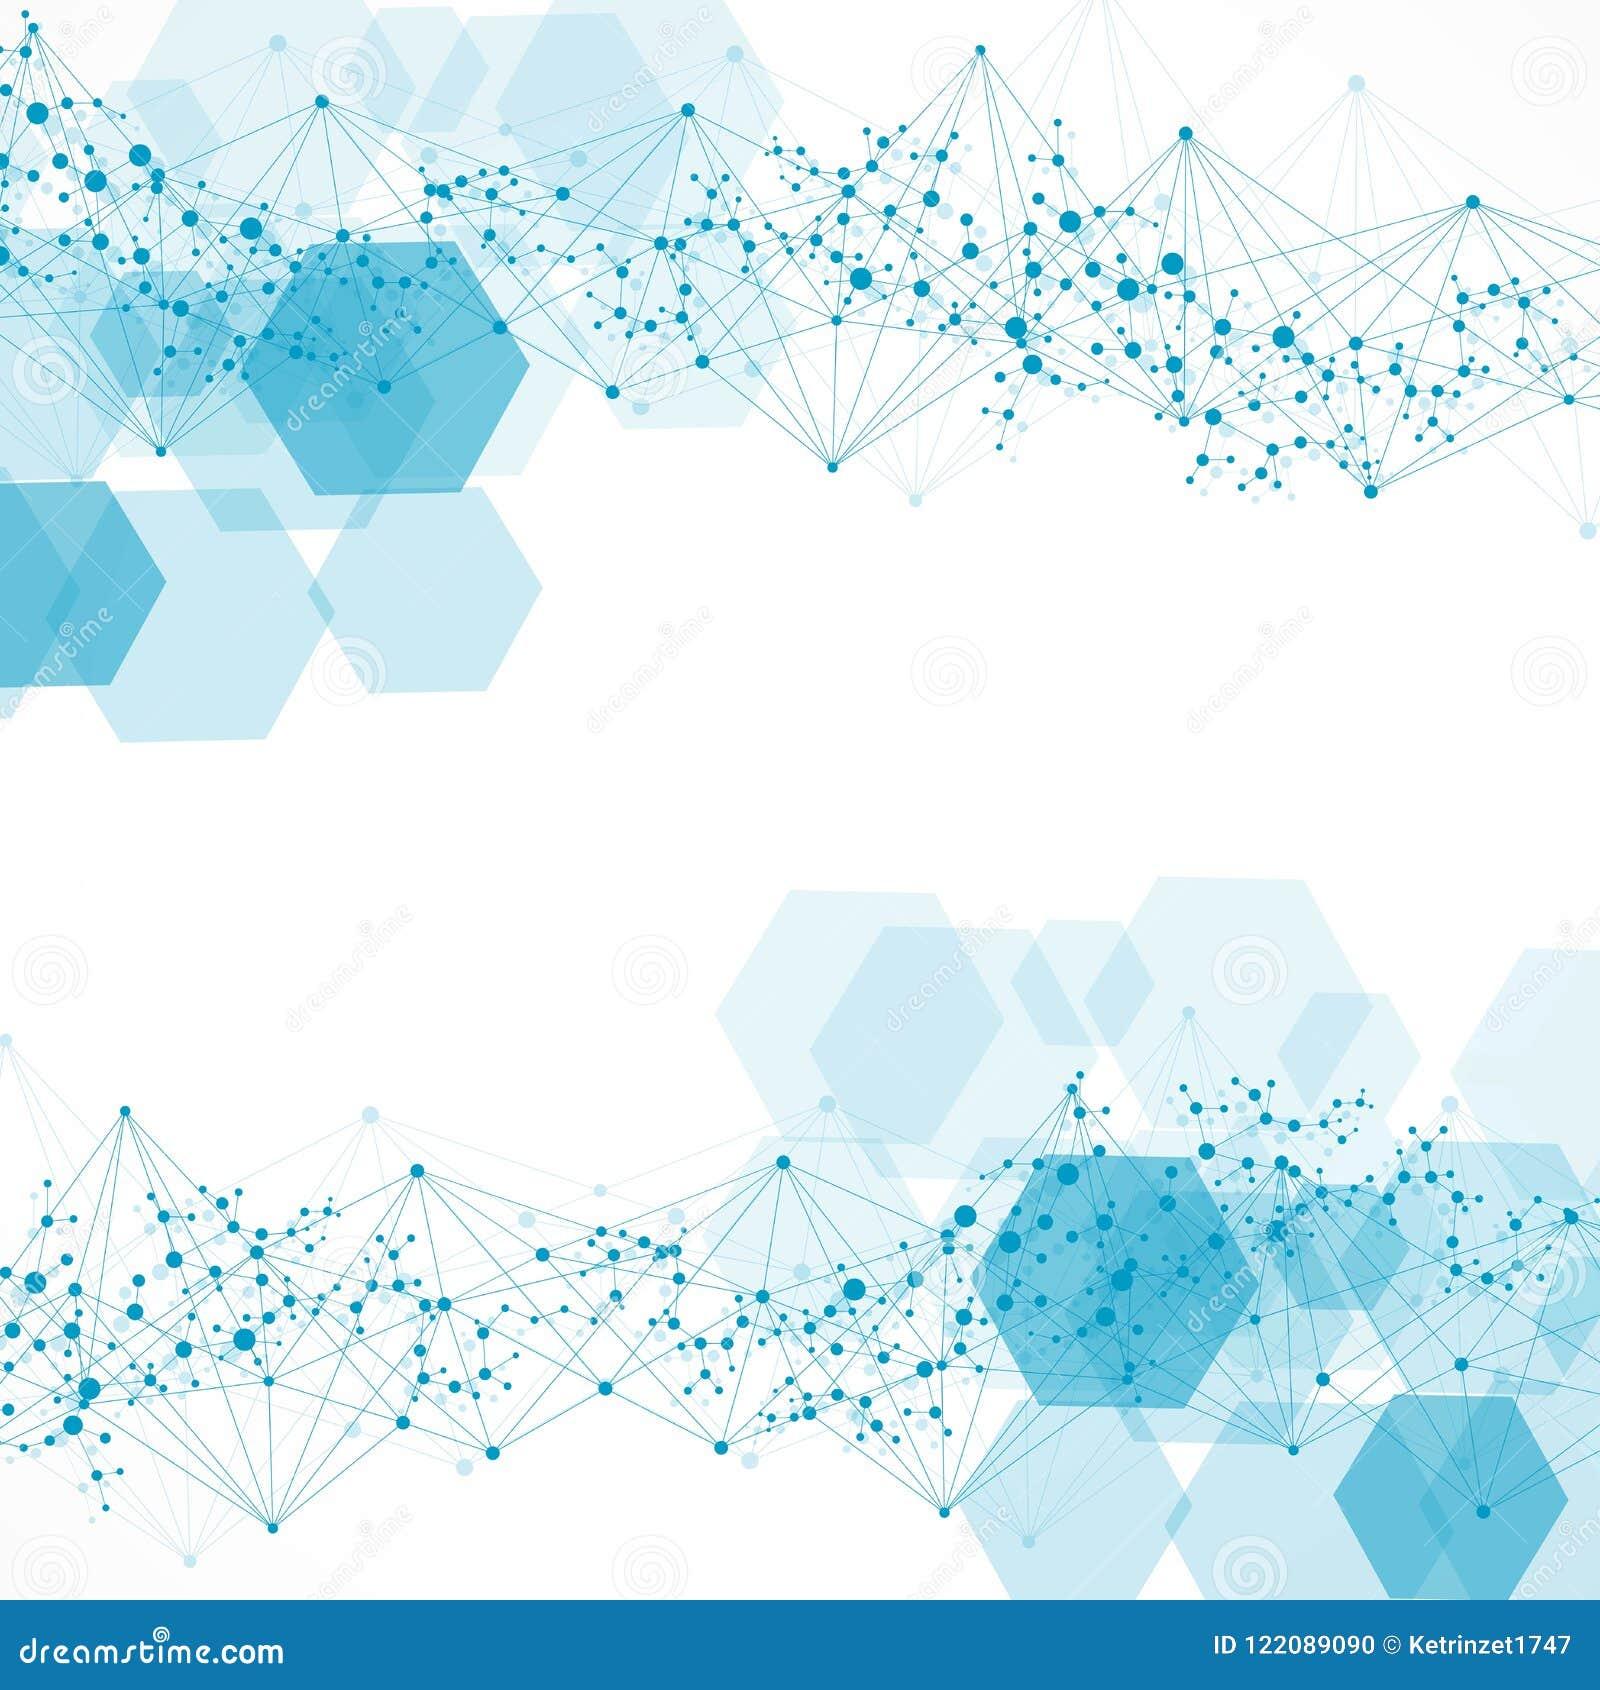 Fondo Abstracto Hexagonal Visualización Grande De Los Datos Conexión ...